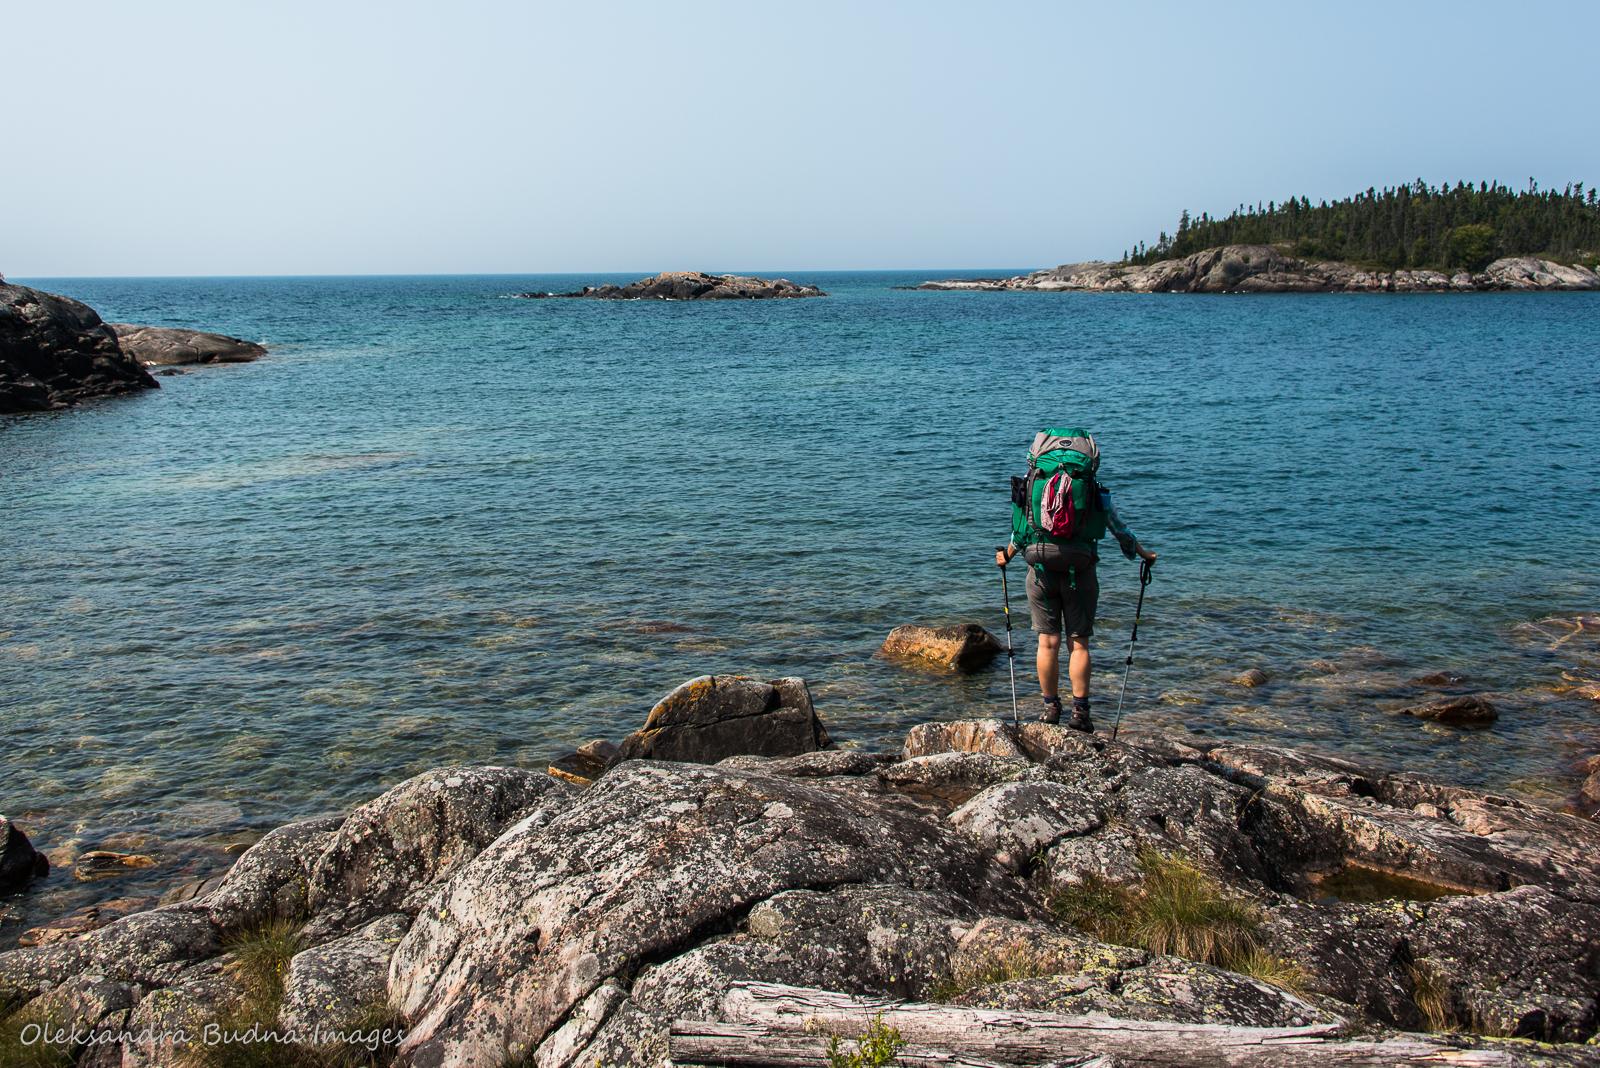 backpacking along the Lake Superior coast in Pukaskwa